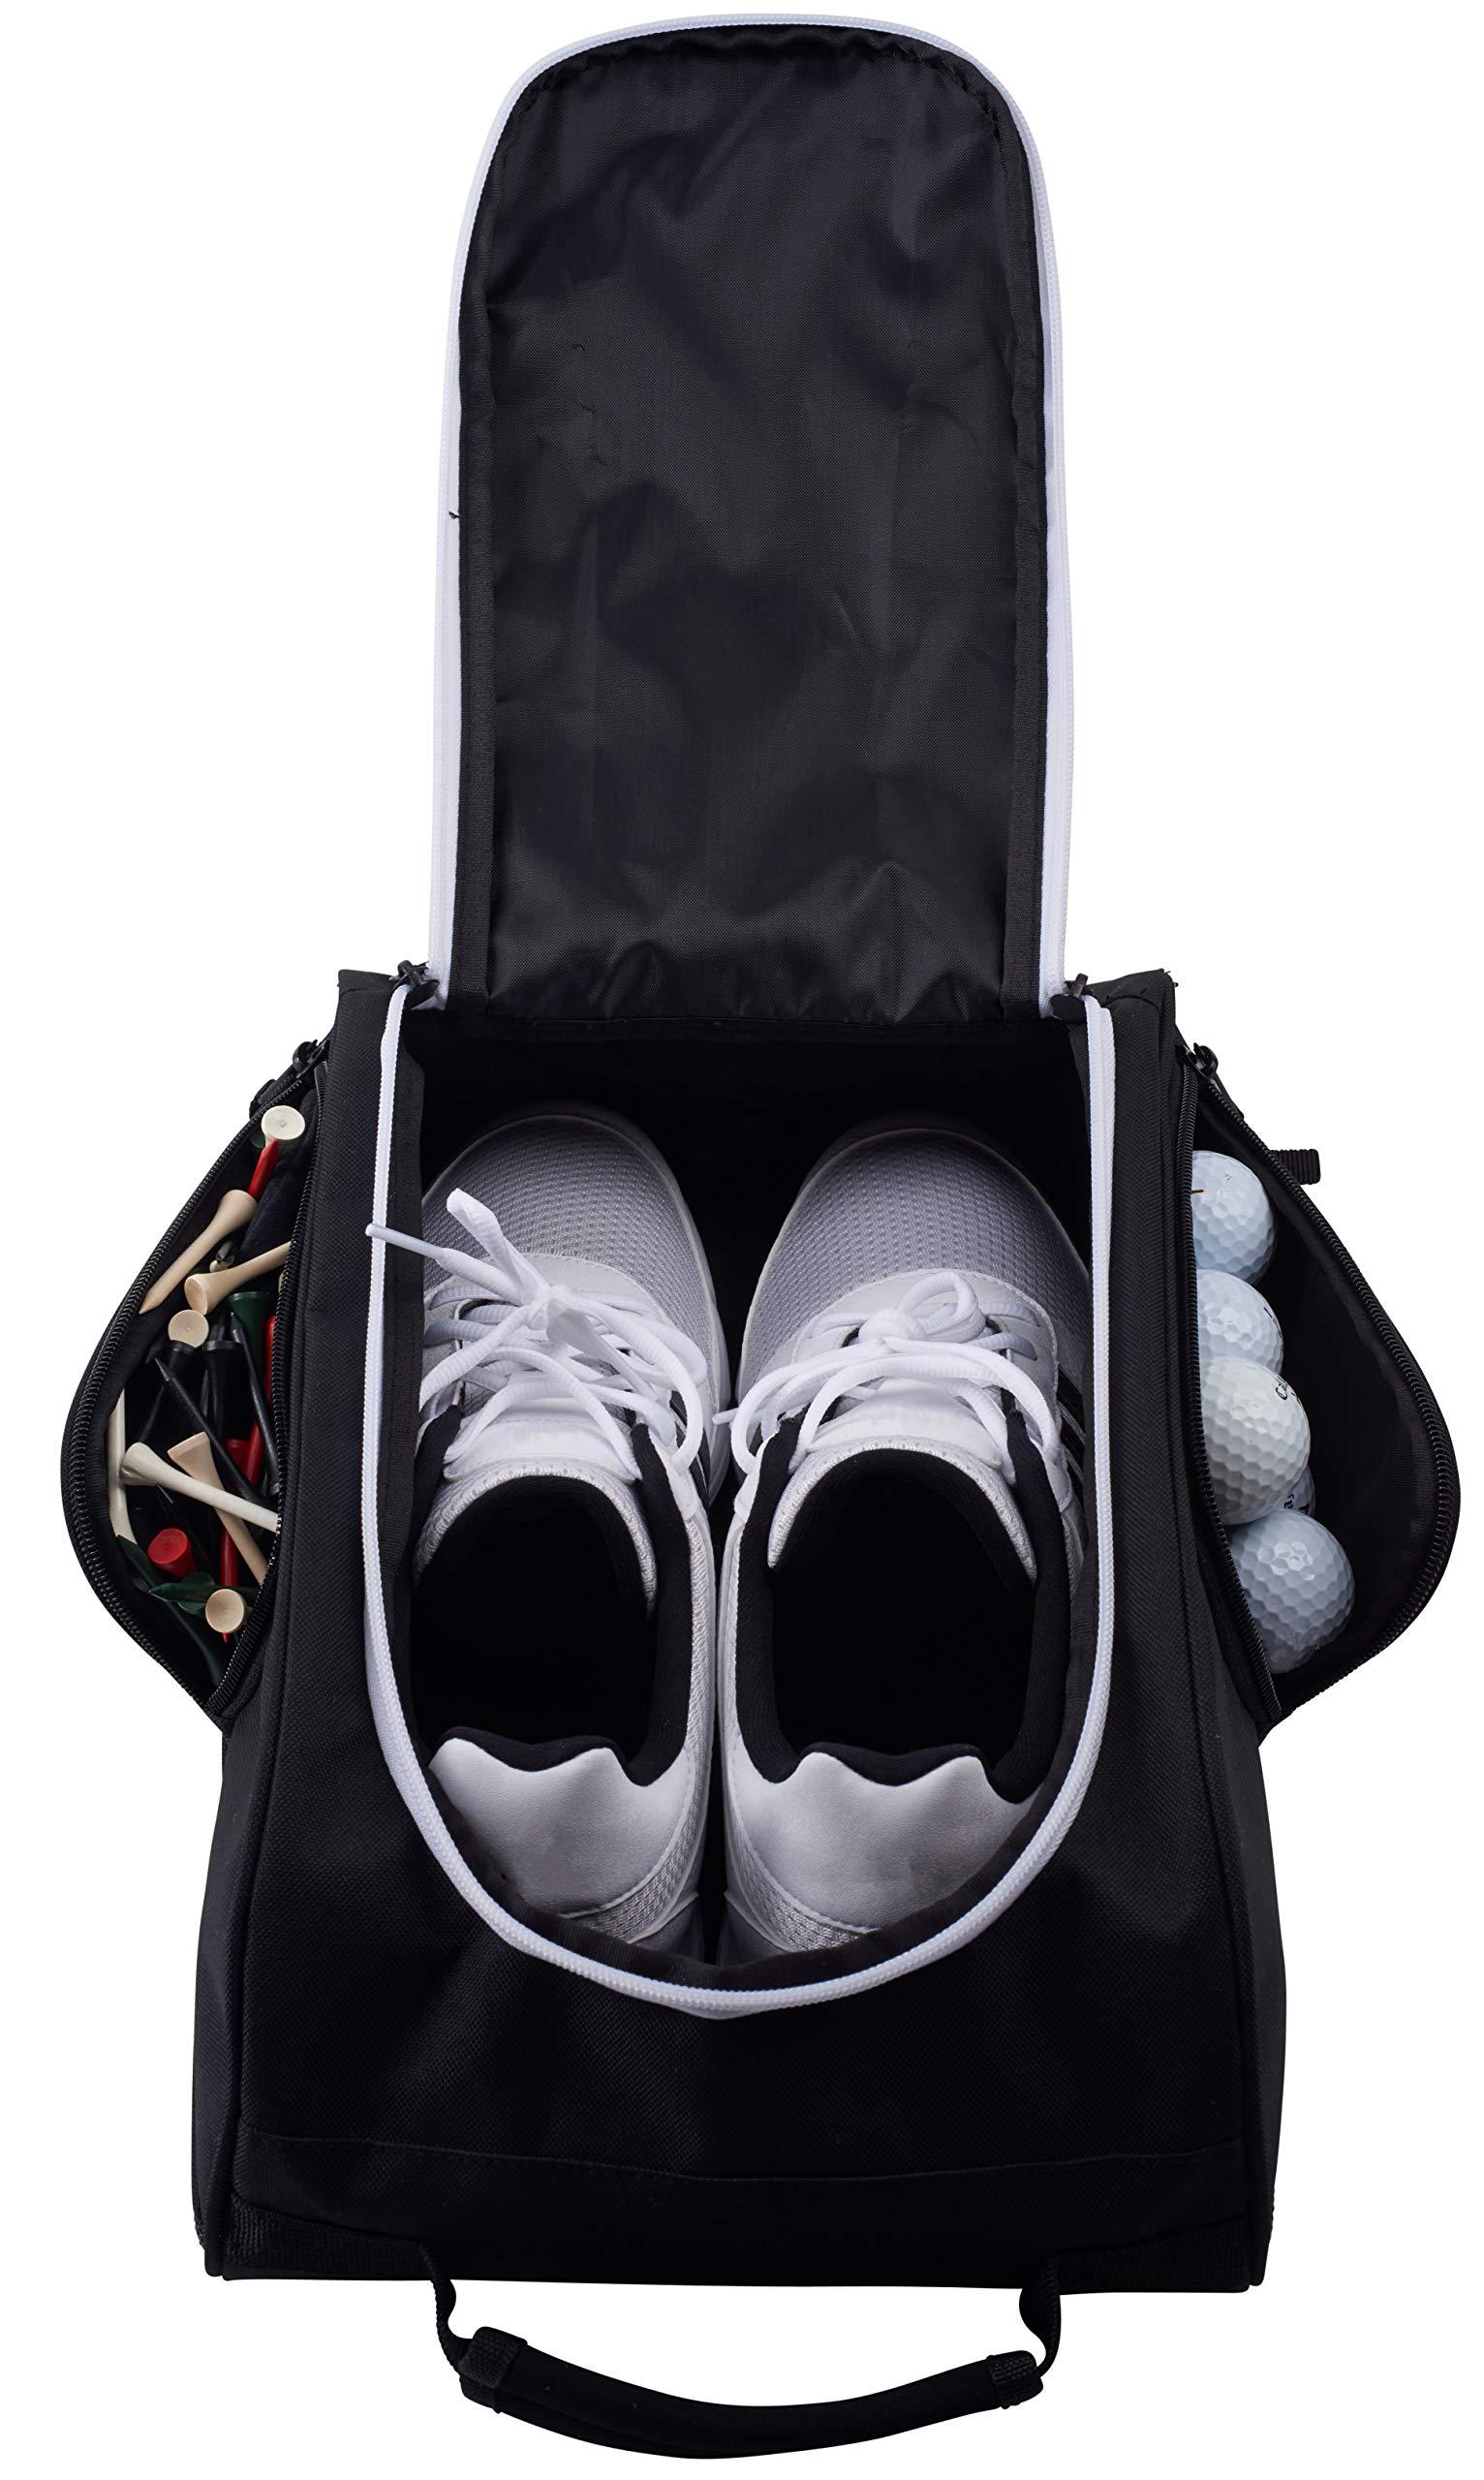 mizuno womens volleyball shoes size 8 x 3 inch hood pins ebay